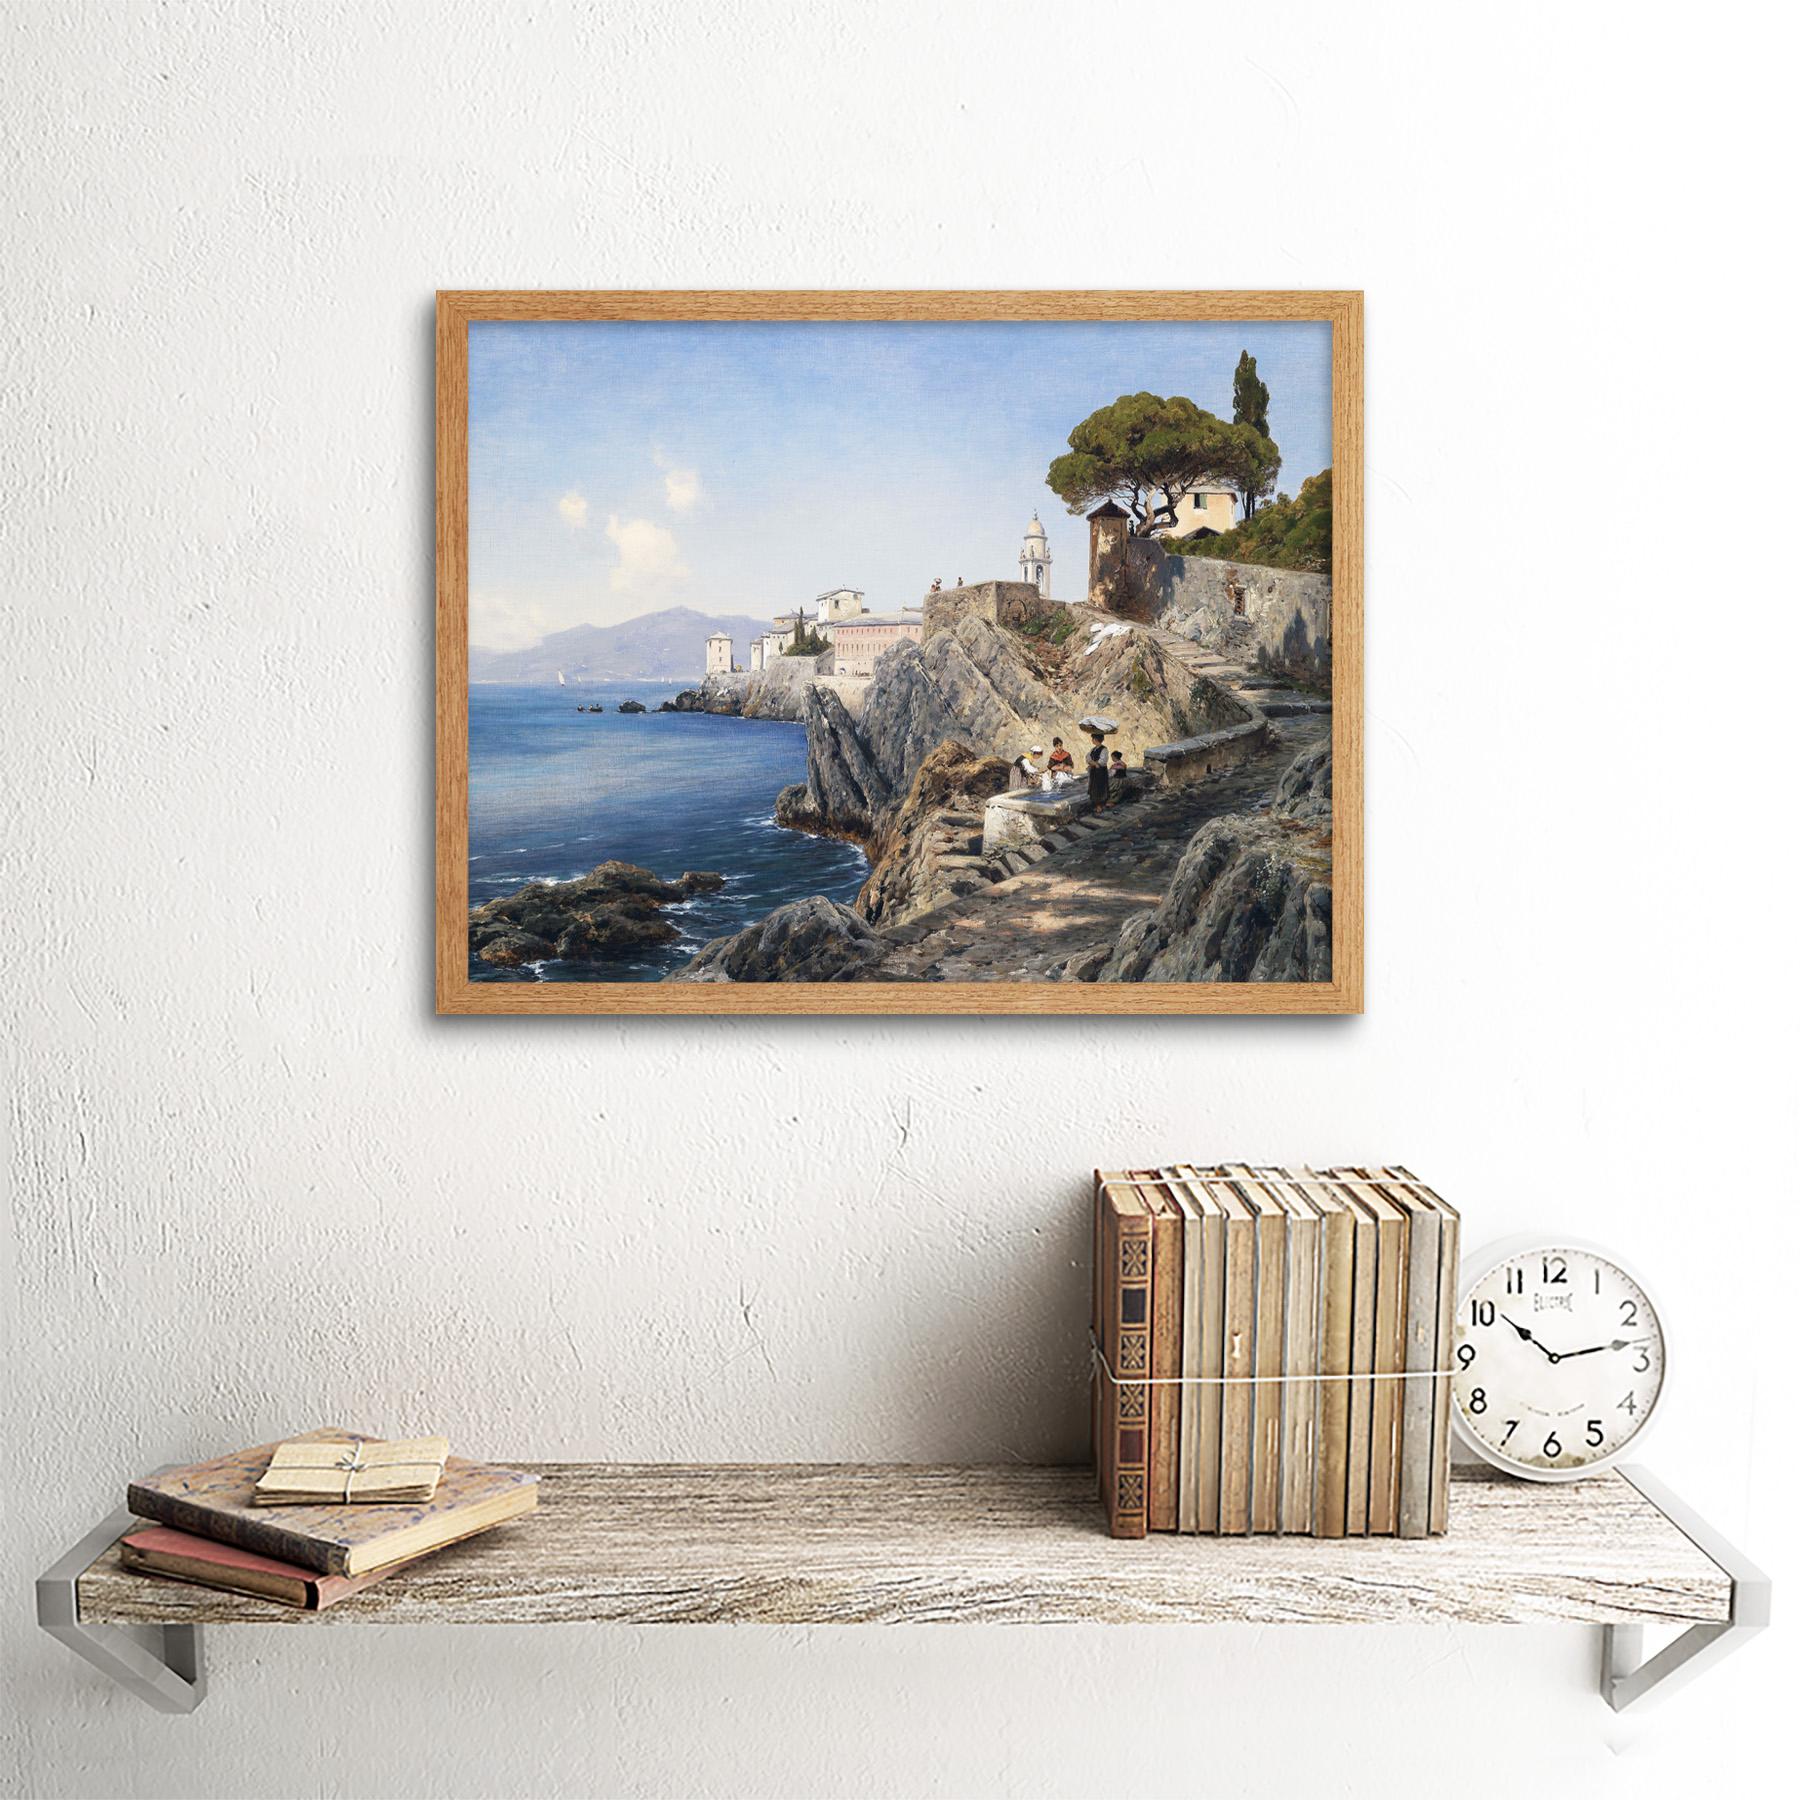 Lutteroth-Sturla-Shore-Genoa-Italy-Seascape-Painting-Art-Print-Framed-12x16 thumbnail 13